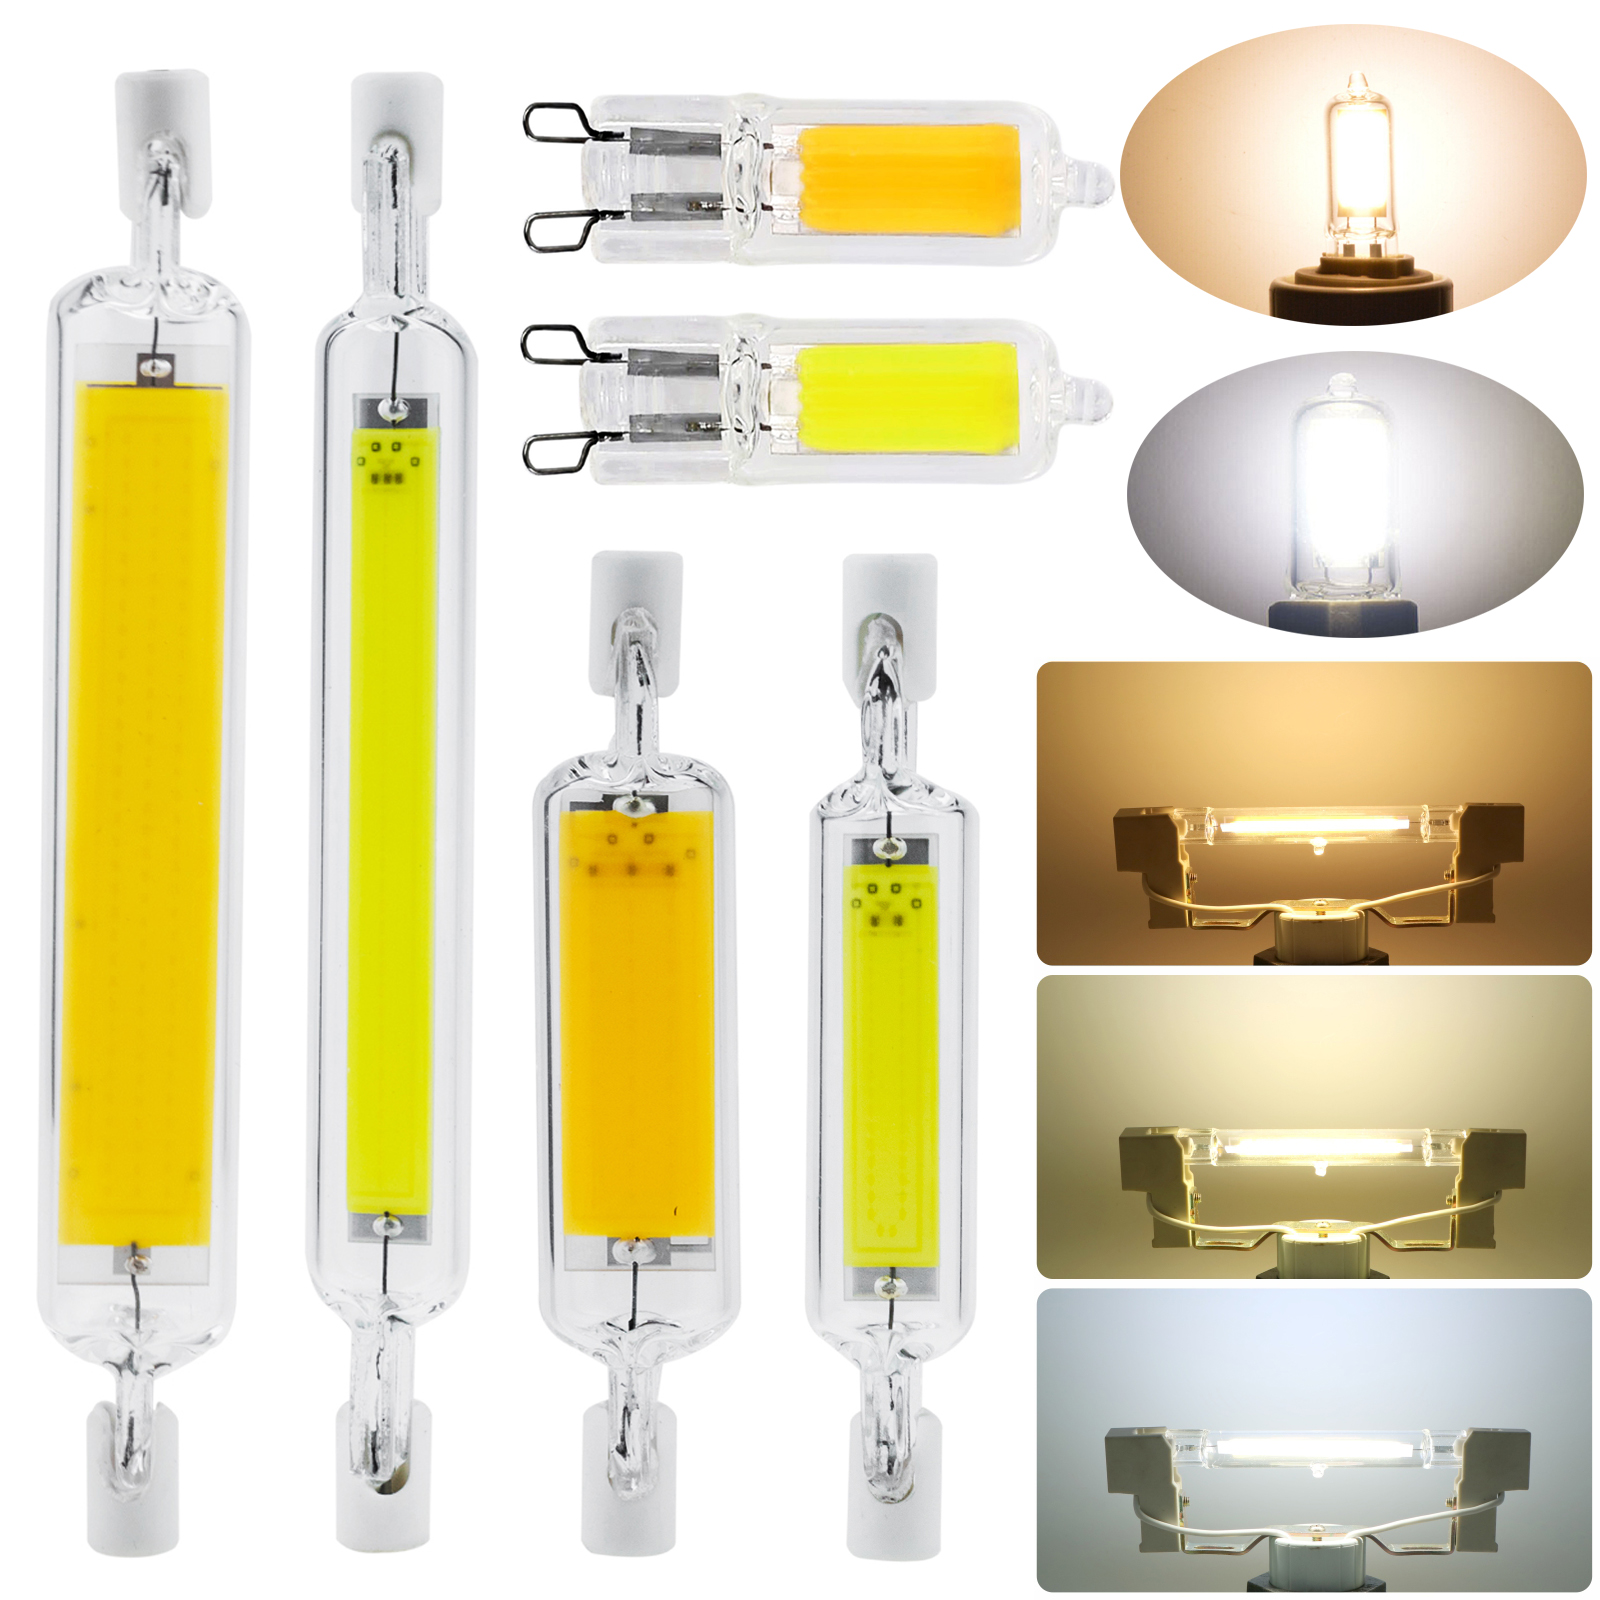 G9 R7s LED COB Light Bulbs Dimmable 78mm 118mm J-type Glass+Ceramics Replace Halogen Lamps 3W 5W 6W 12W 20W Floodlight 110V-240V